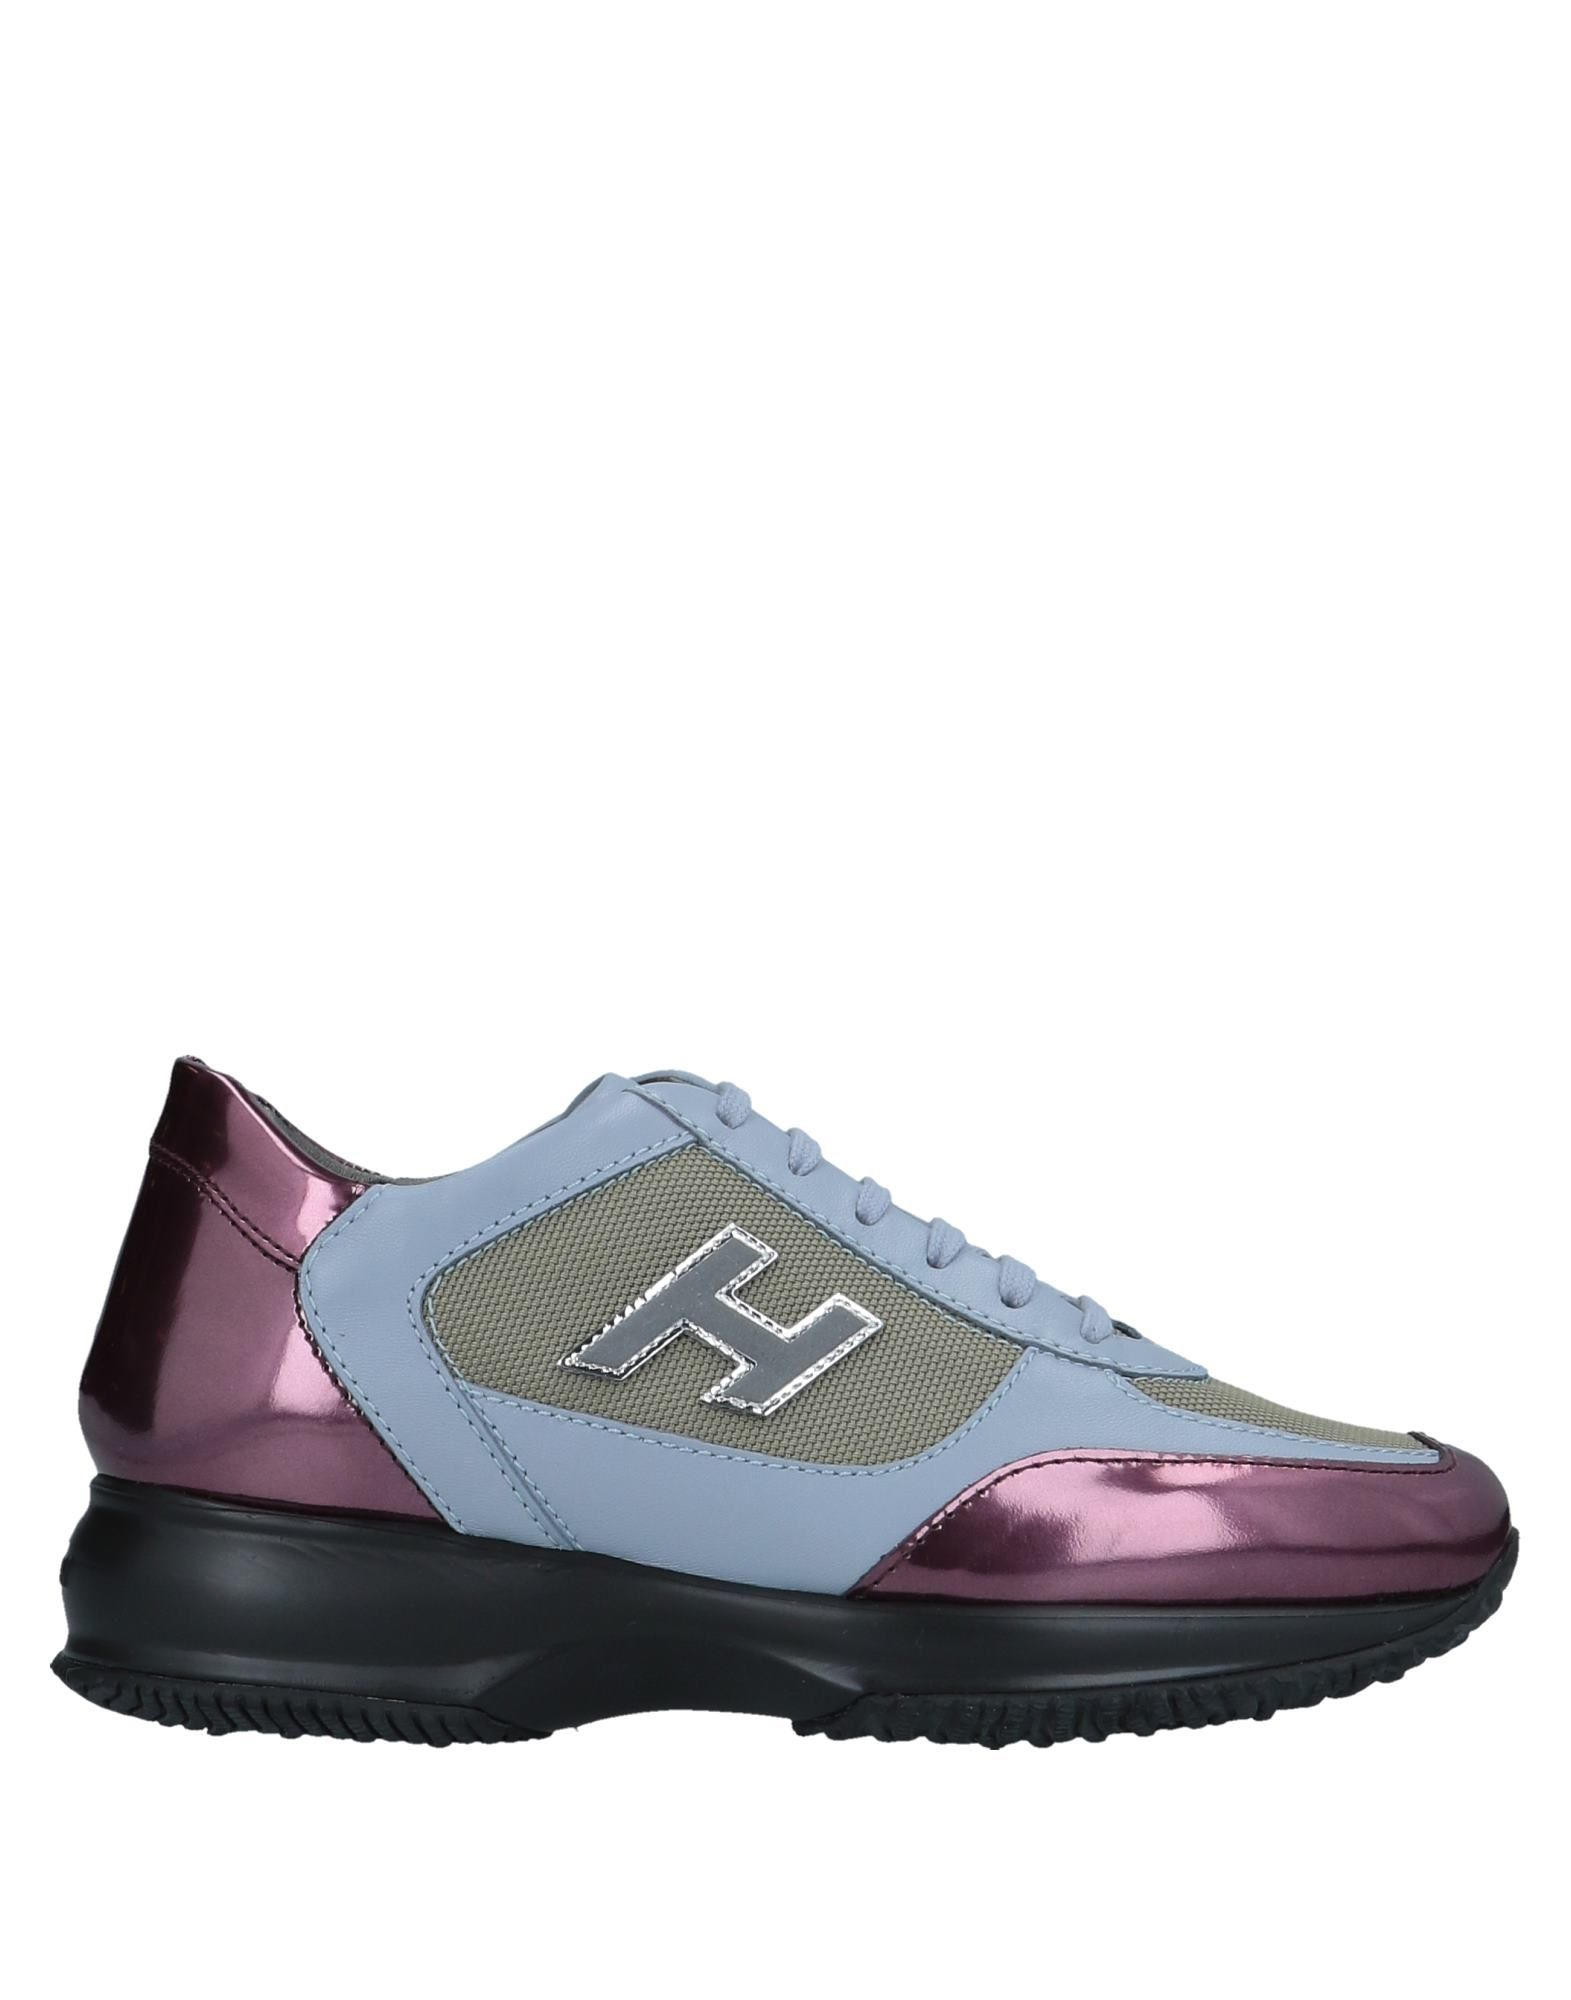 Hogan Sneakers Damen  11539866WNGut aussehende strapazierfähige Schuhe